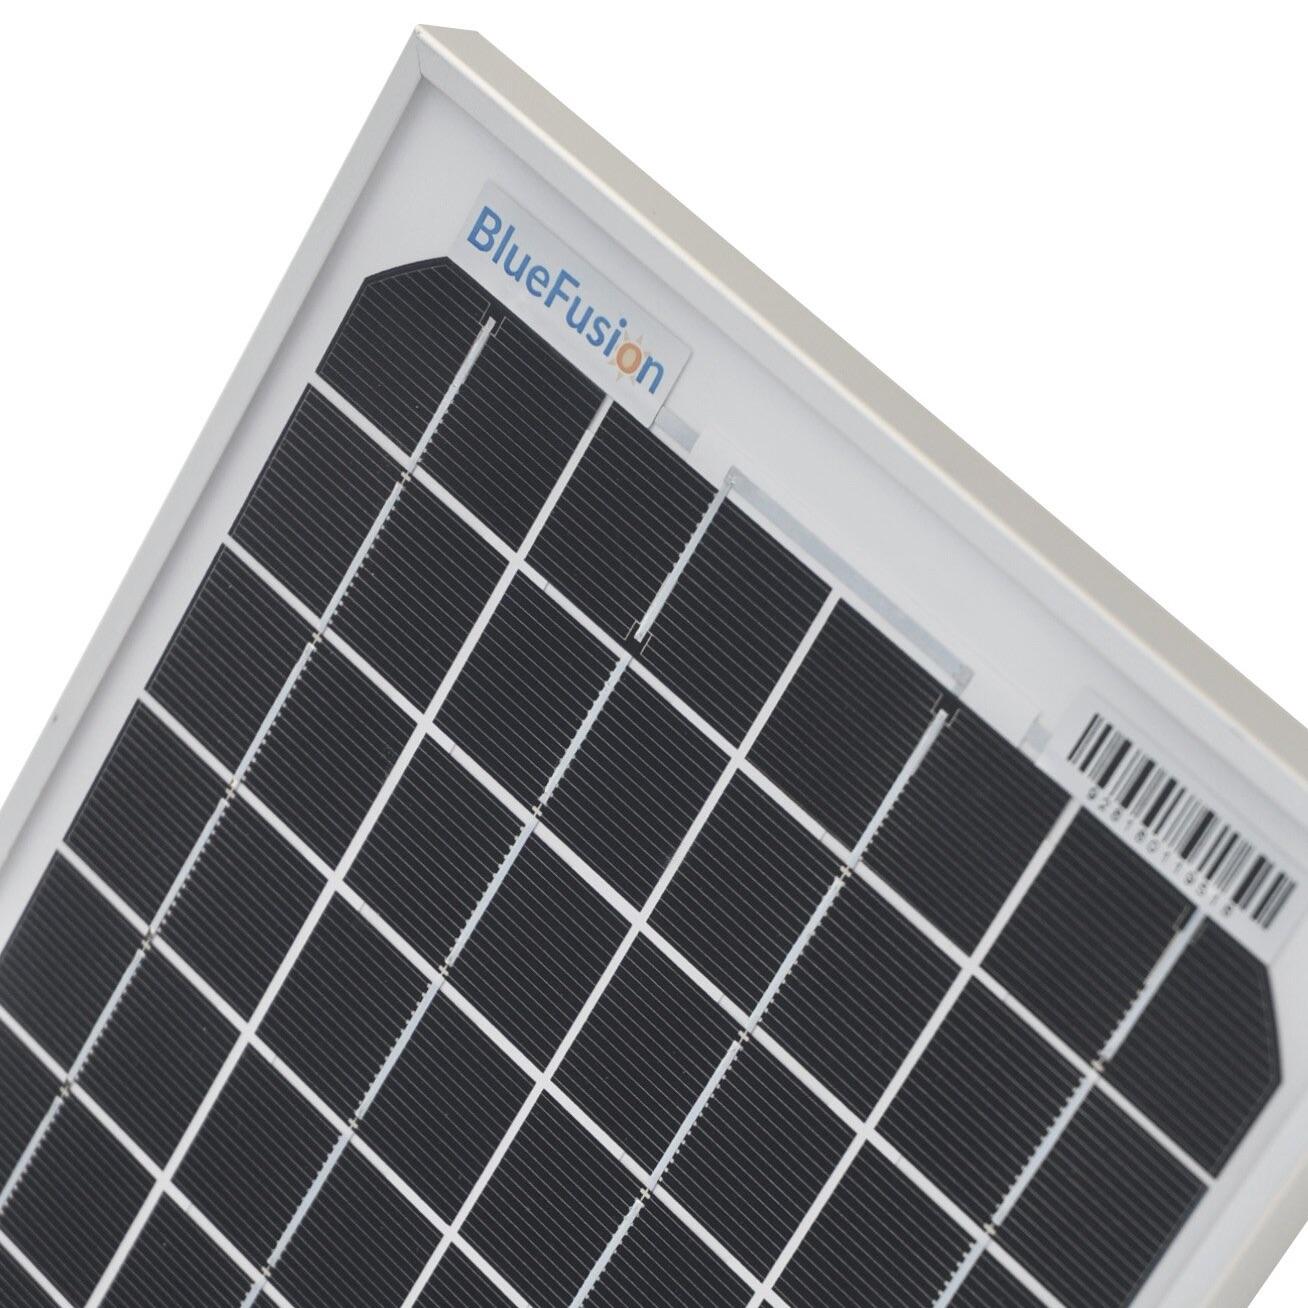 Bluefusion Mono Solar Panels 10w 100w For Grid Tie